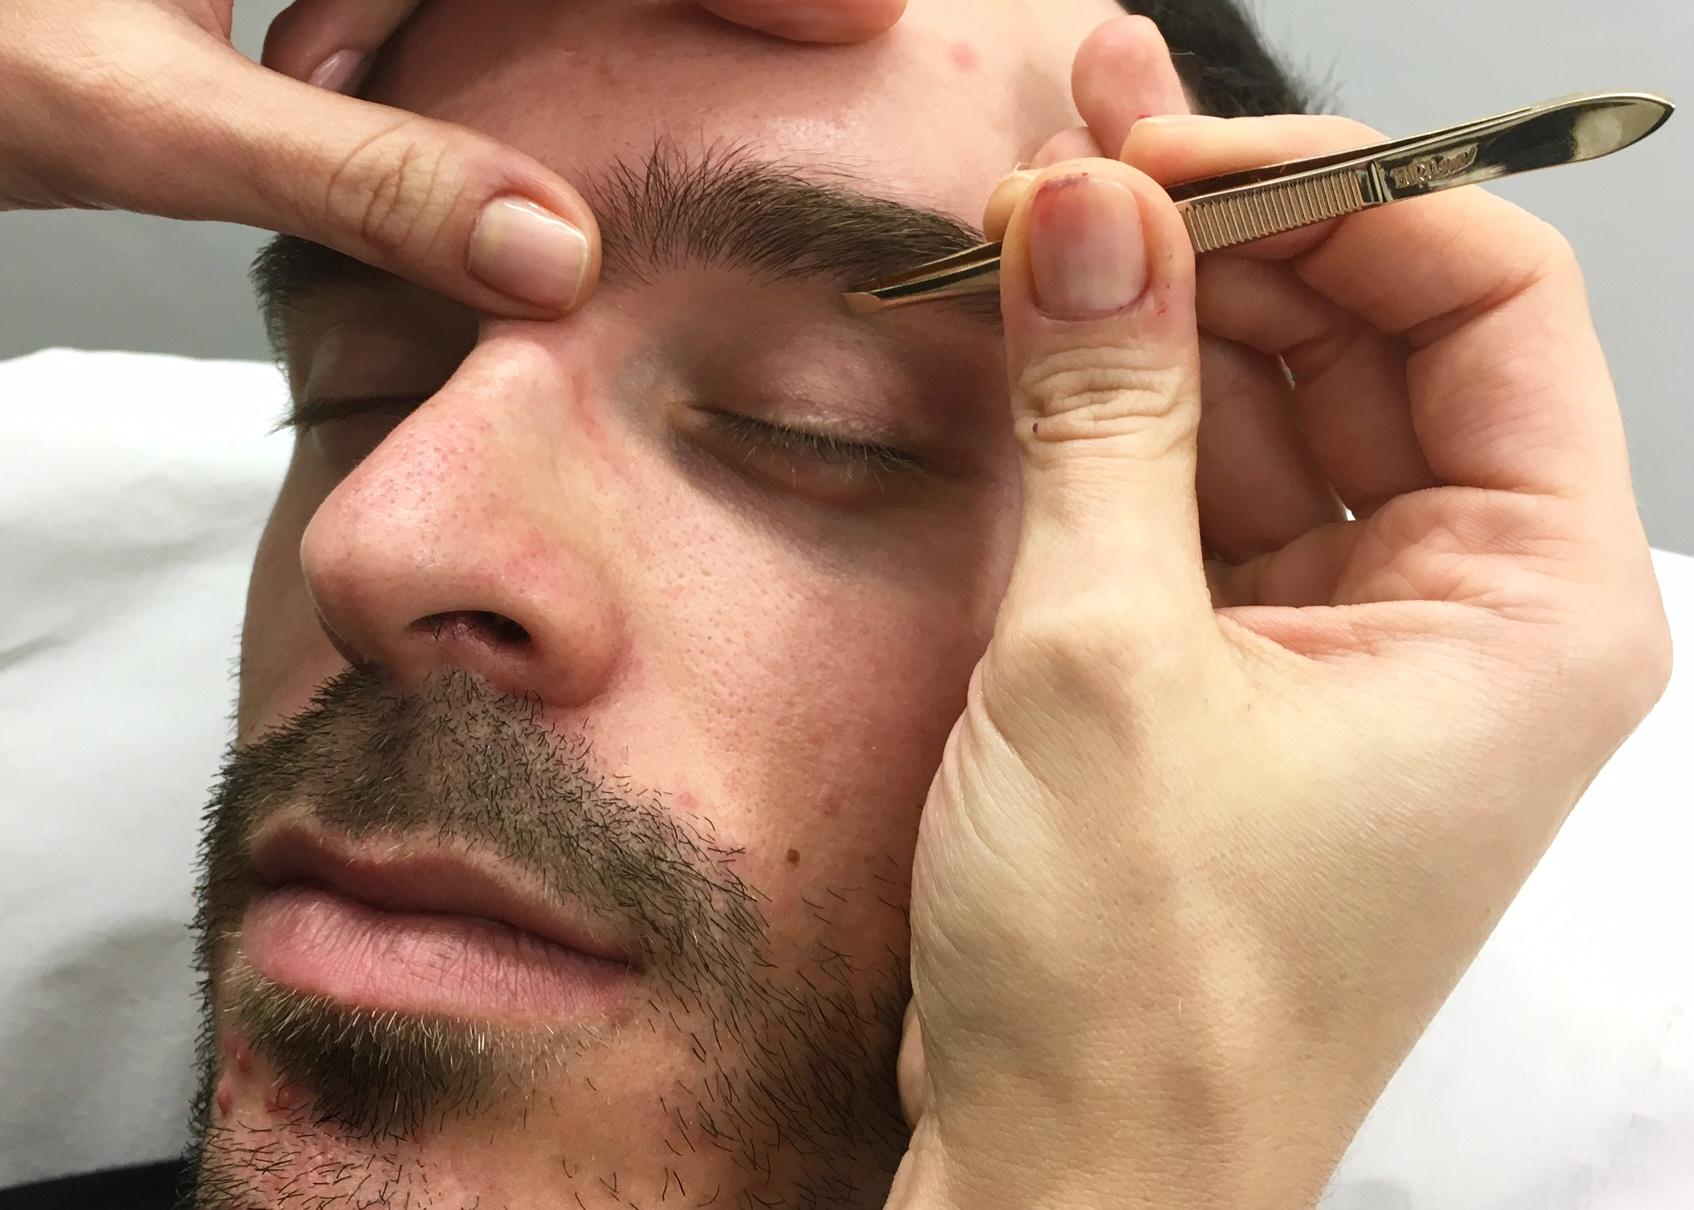 Cejas De Hombre diseño cejas para hombre - isabel bedia alicante